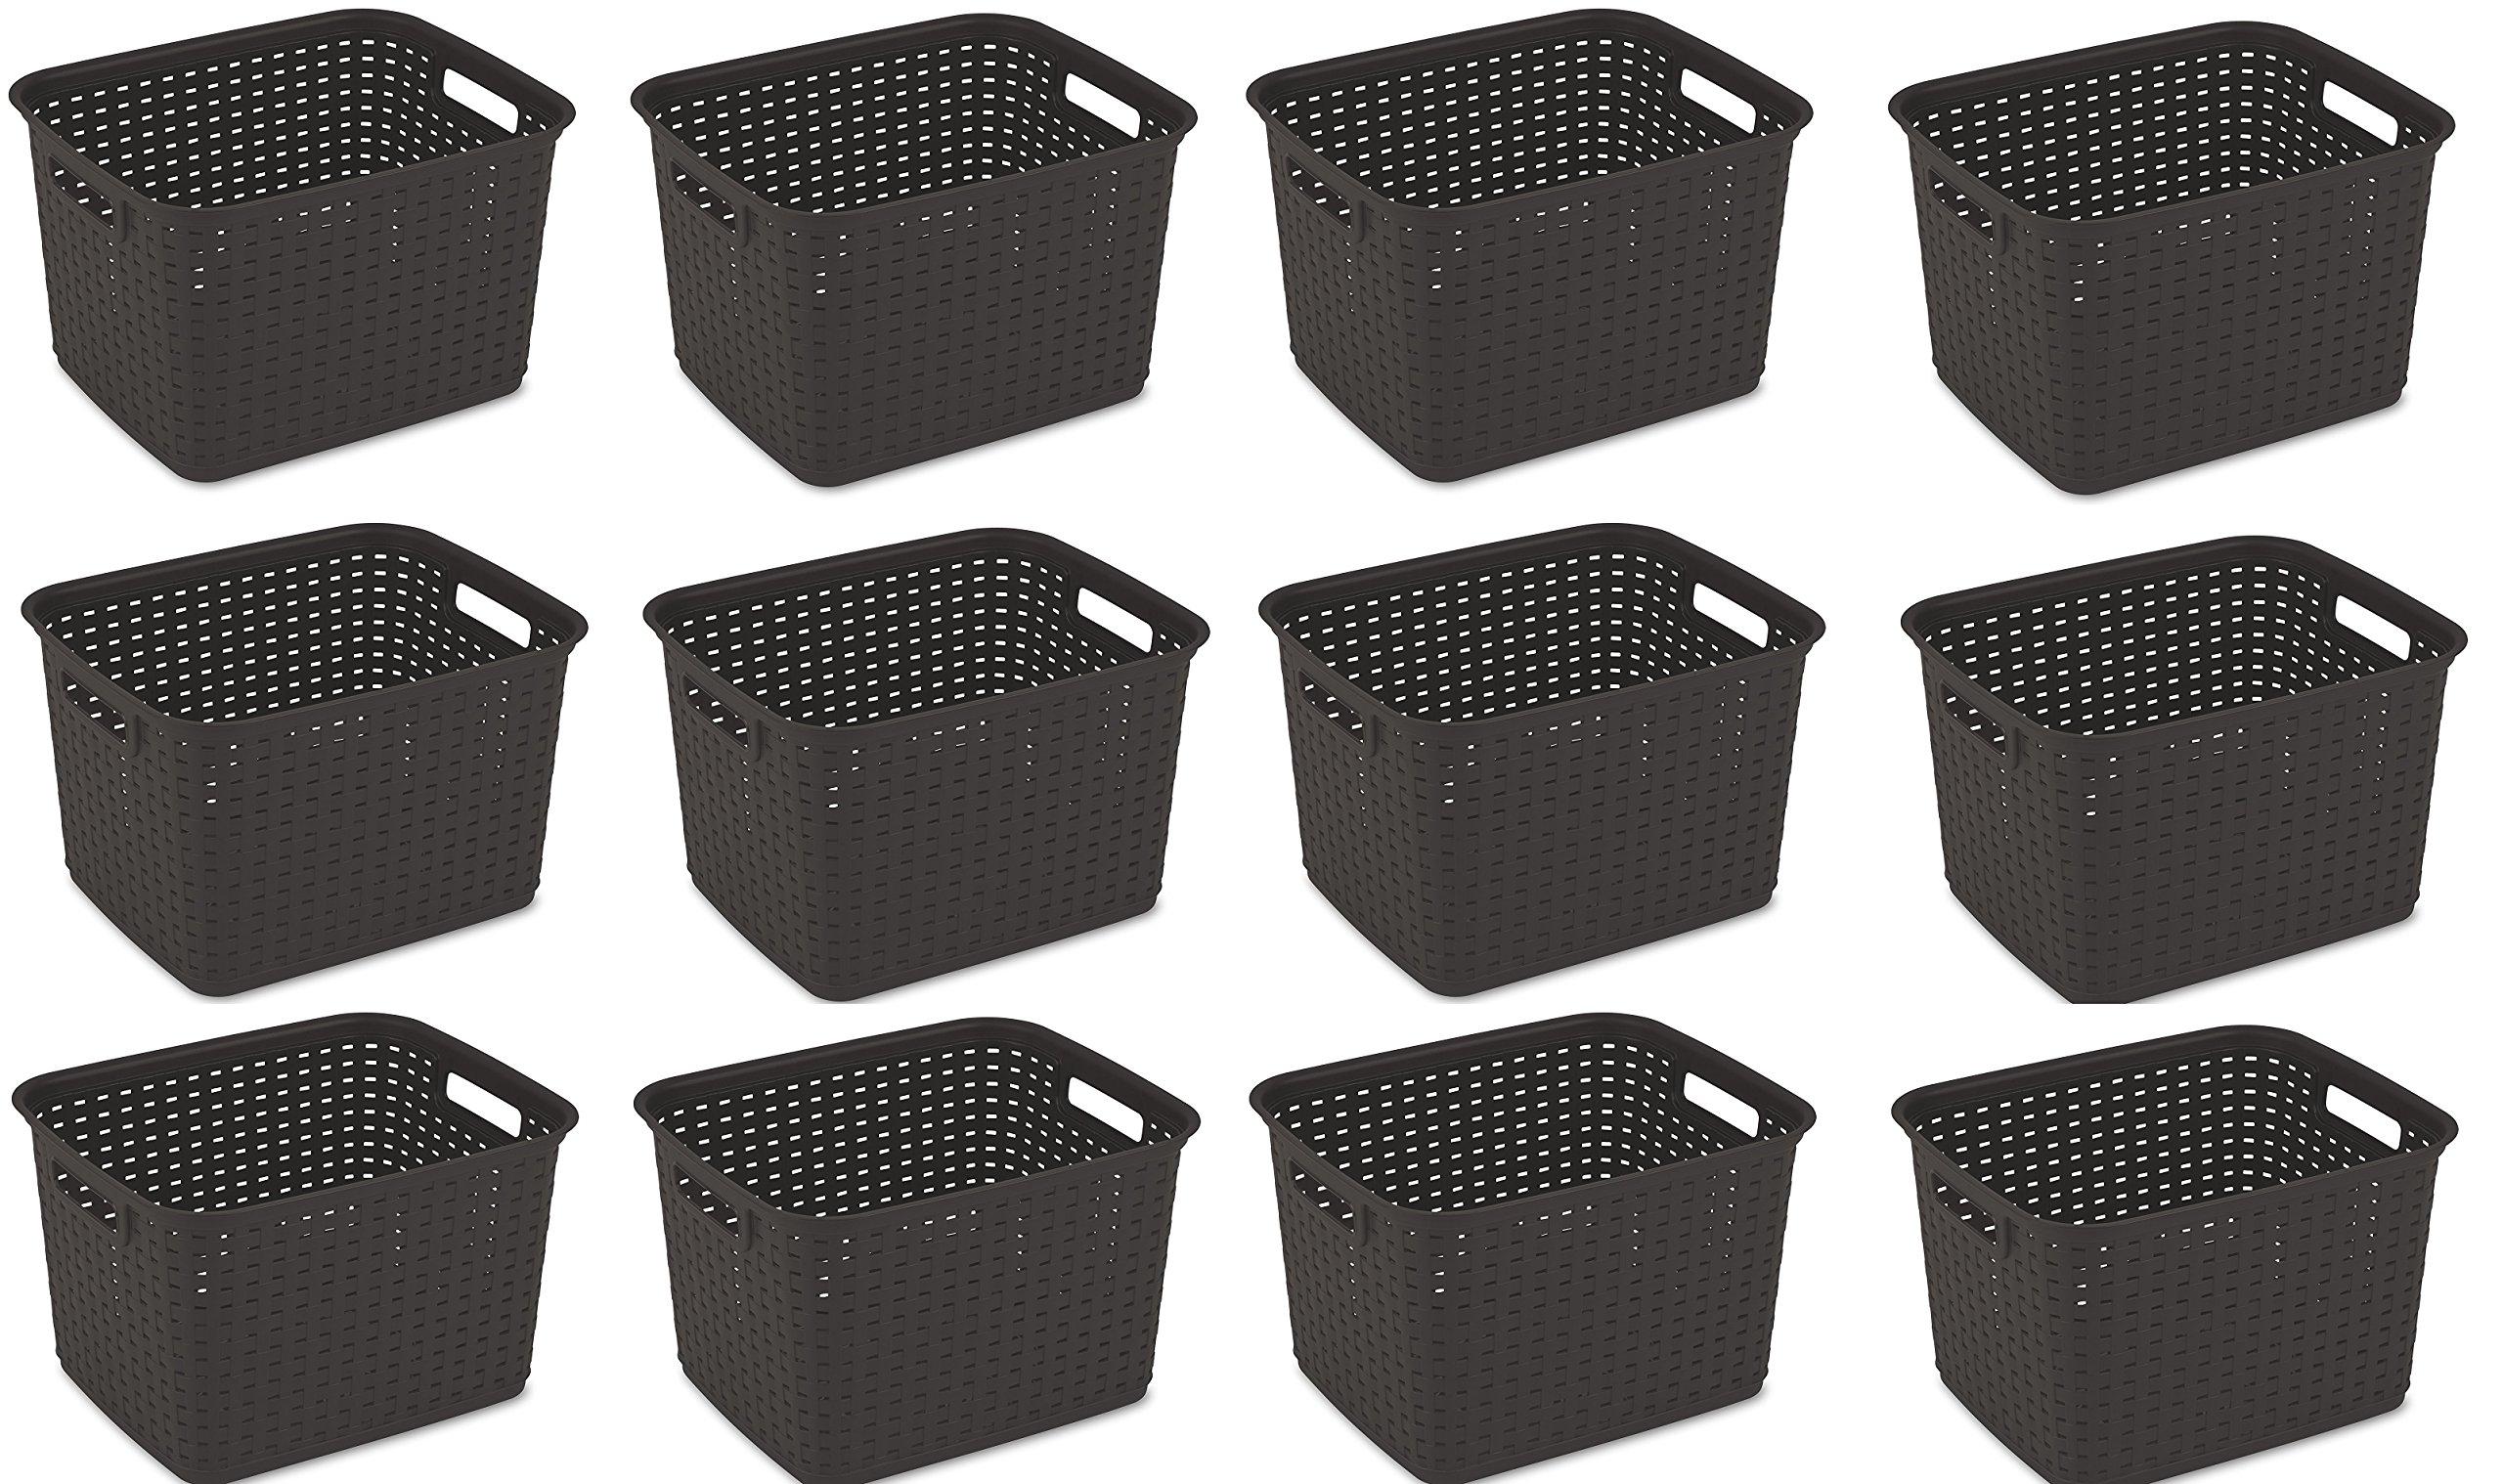 Sterilite 12736P06 Tall Weave Basket, Espresso, 6-Pack (Basket 12-Pack)